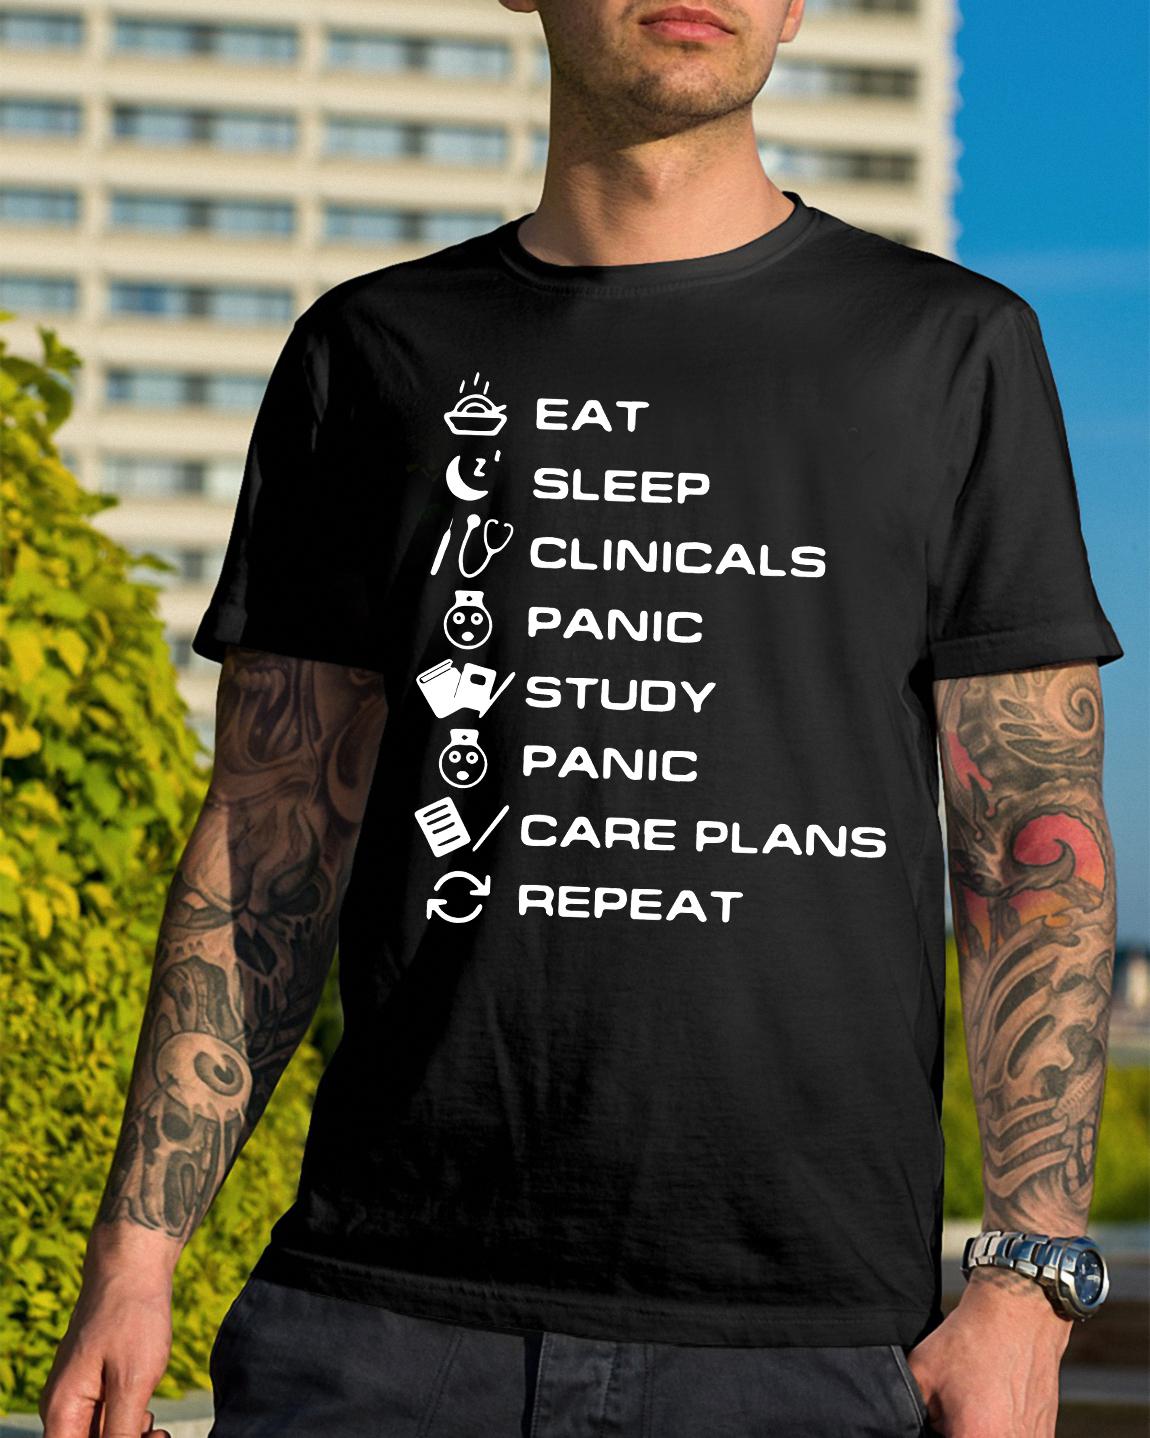 Eat Sleep Clinicals Panic Study Panic Care Plans Repeat Shirt